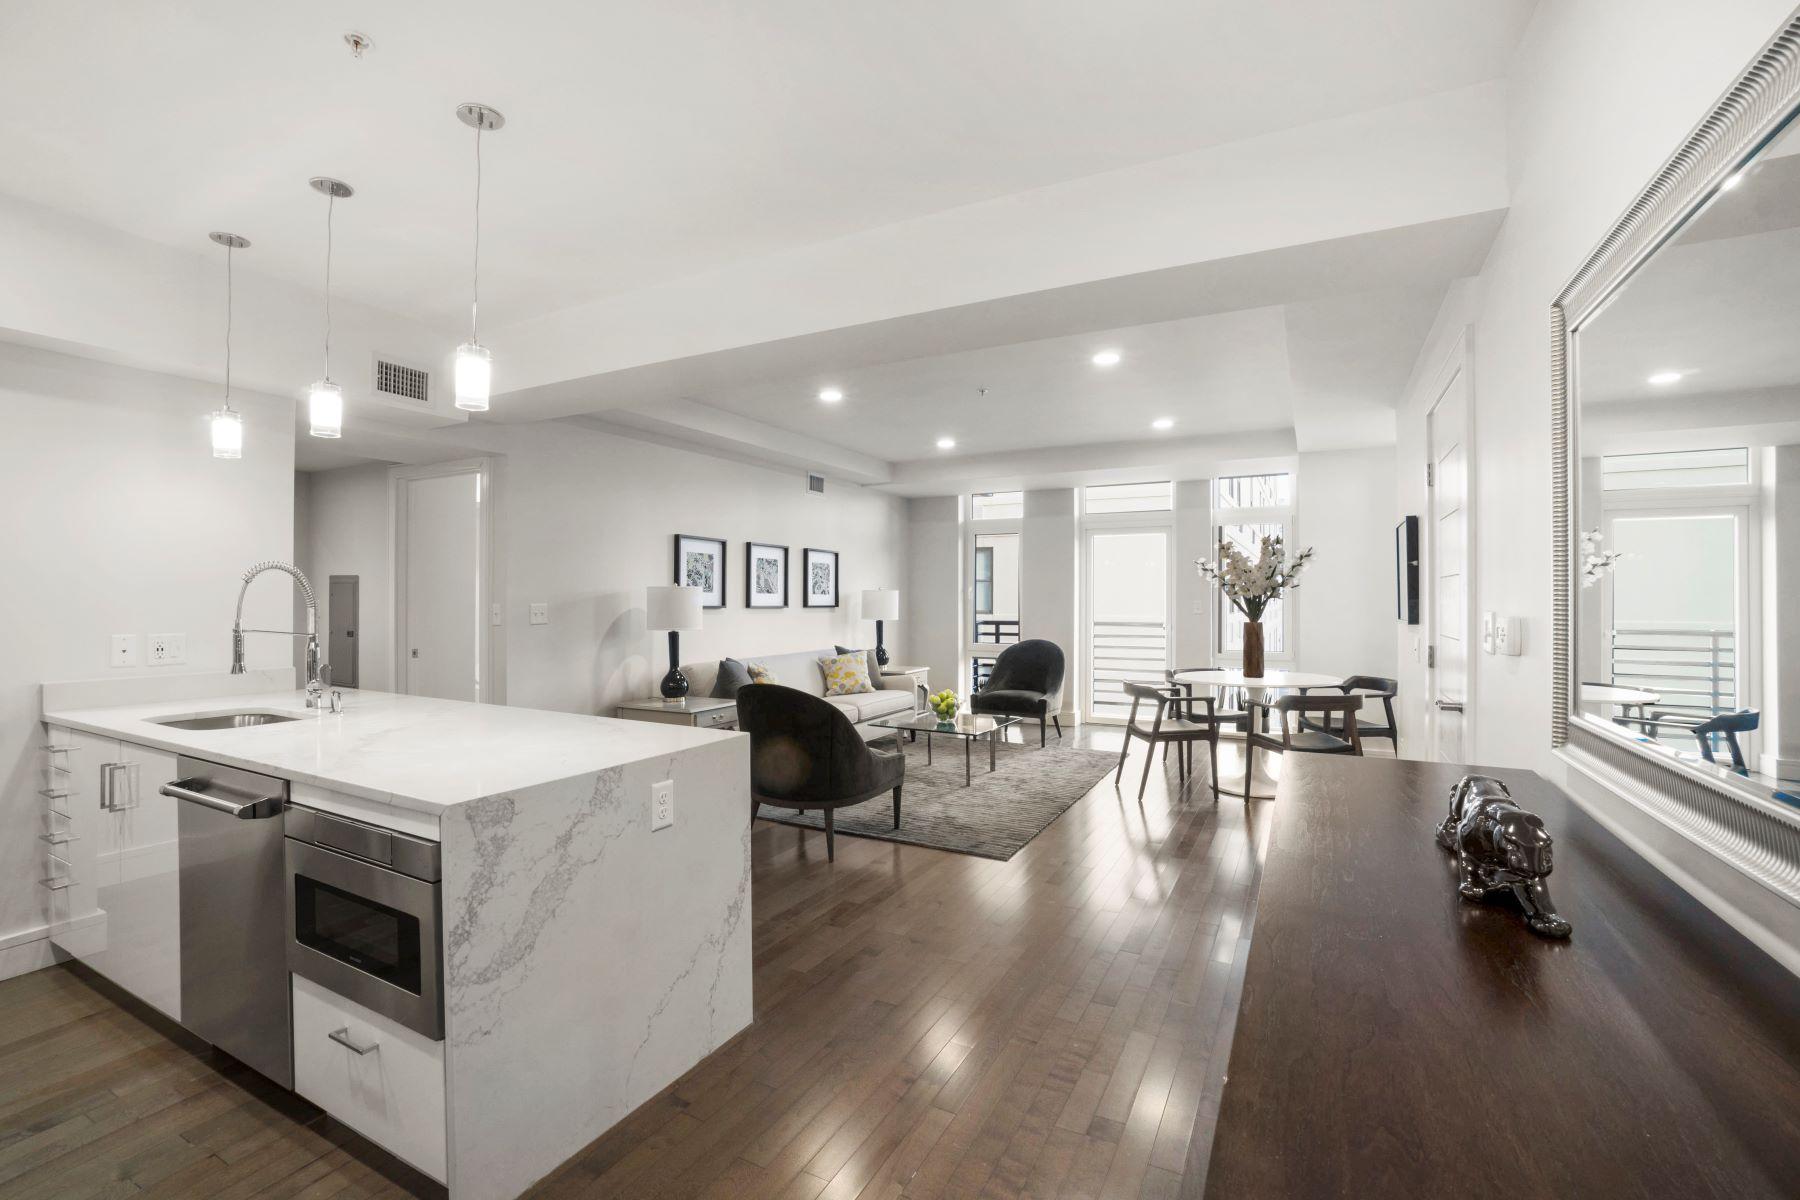 Condominiums for Sale at 262 Monsignor 0'Brien Hwy - Unit 405 Cambridge, Massachusetts 02141 United States